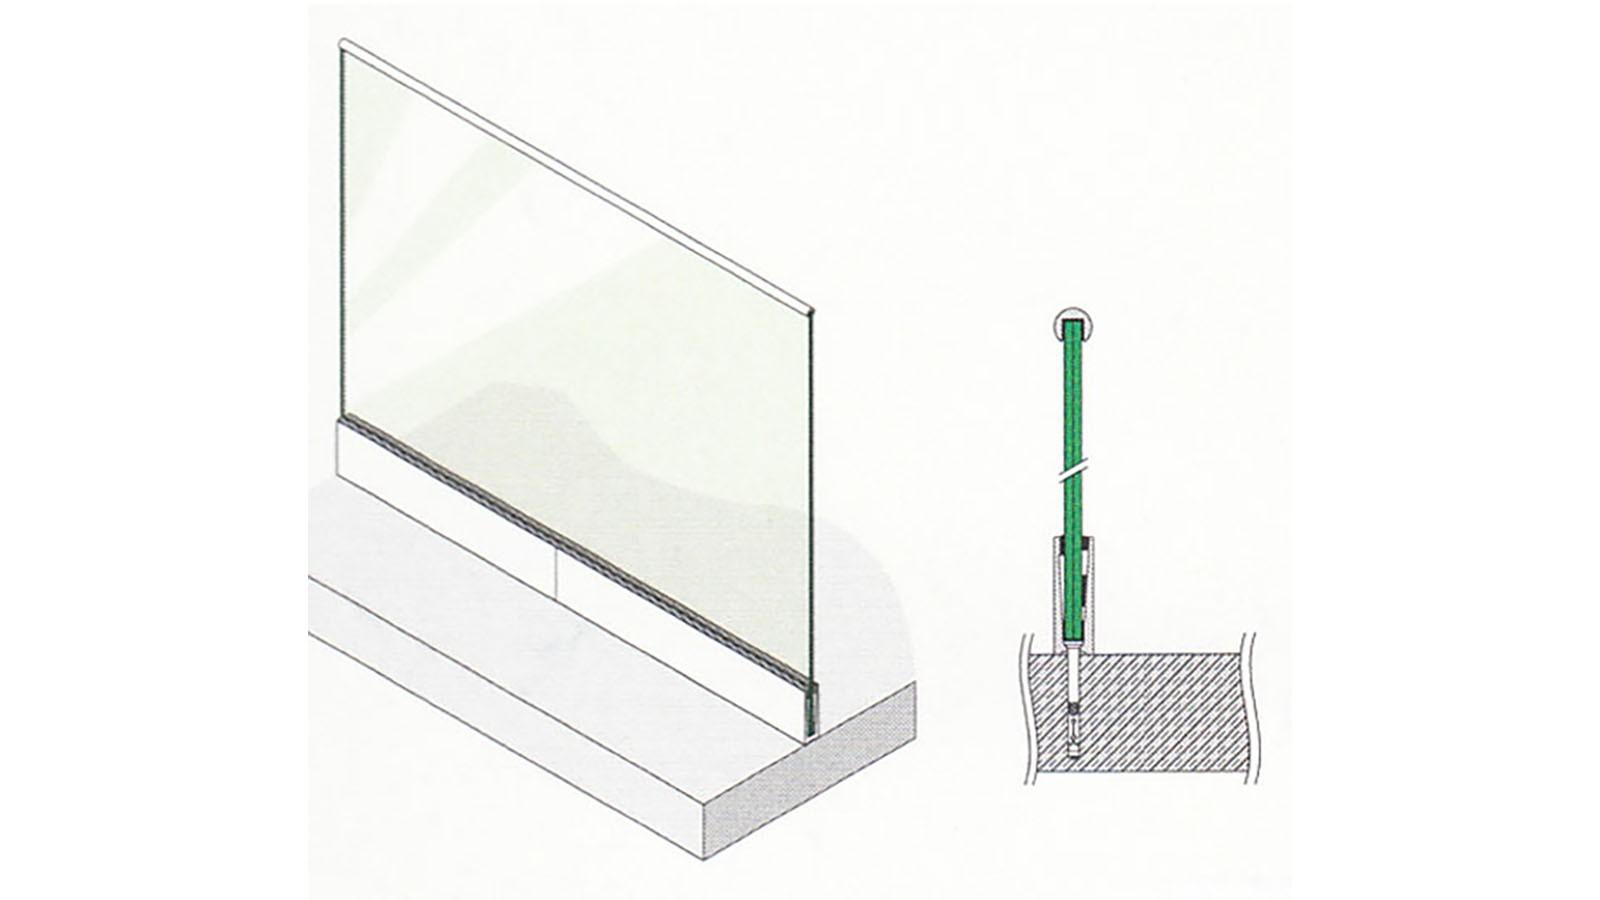 ganzglasgel nder alu bodenprofil bodenmontage aluminium l 2 5m silber eloxiert f r 56 65. Black Bedroom Furniture Sets. Home Design Ideas